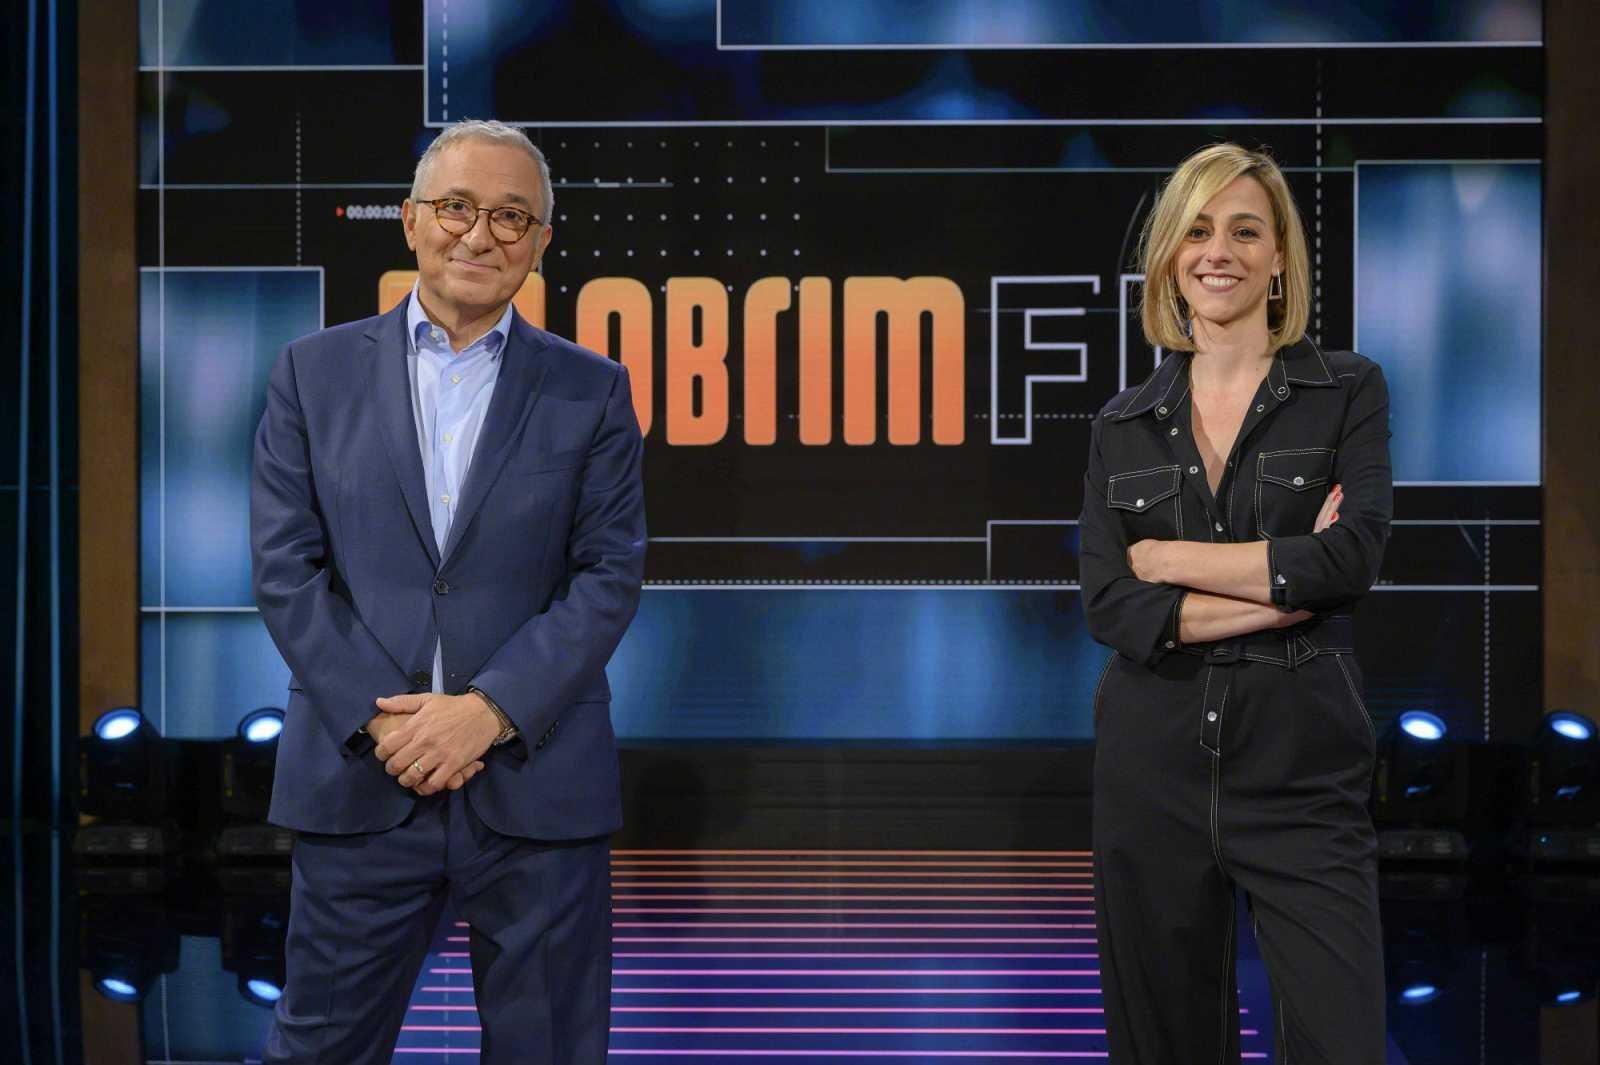 Xavier Sardà i Ana Boadas al plató del programa